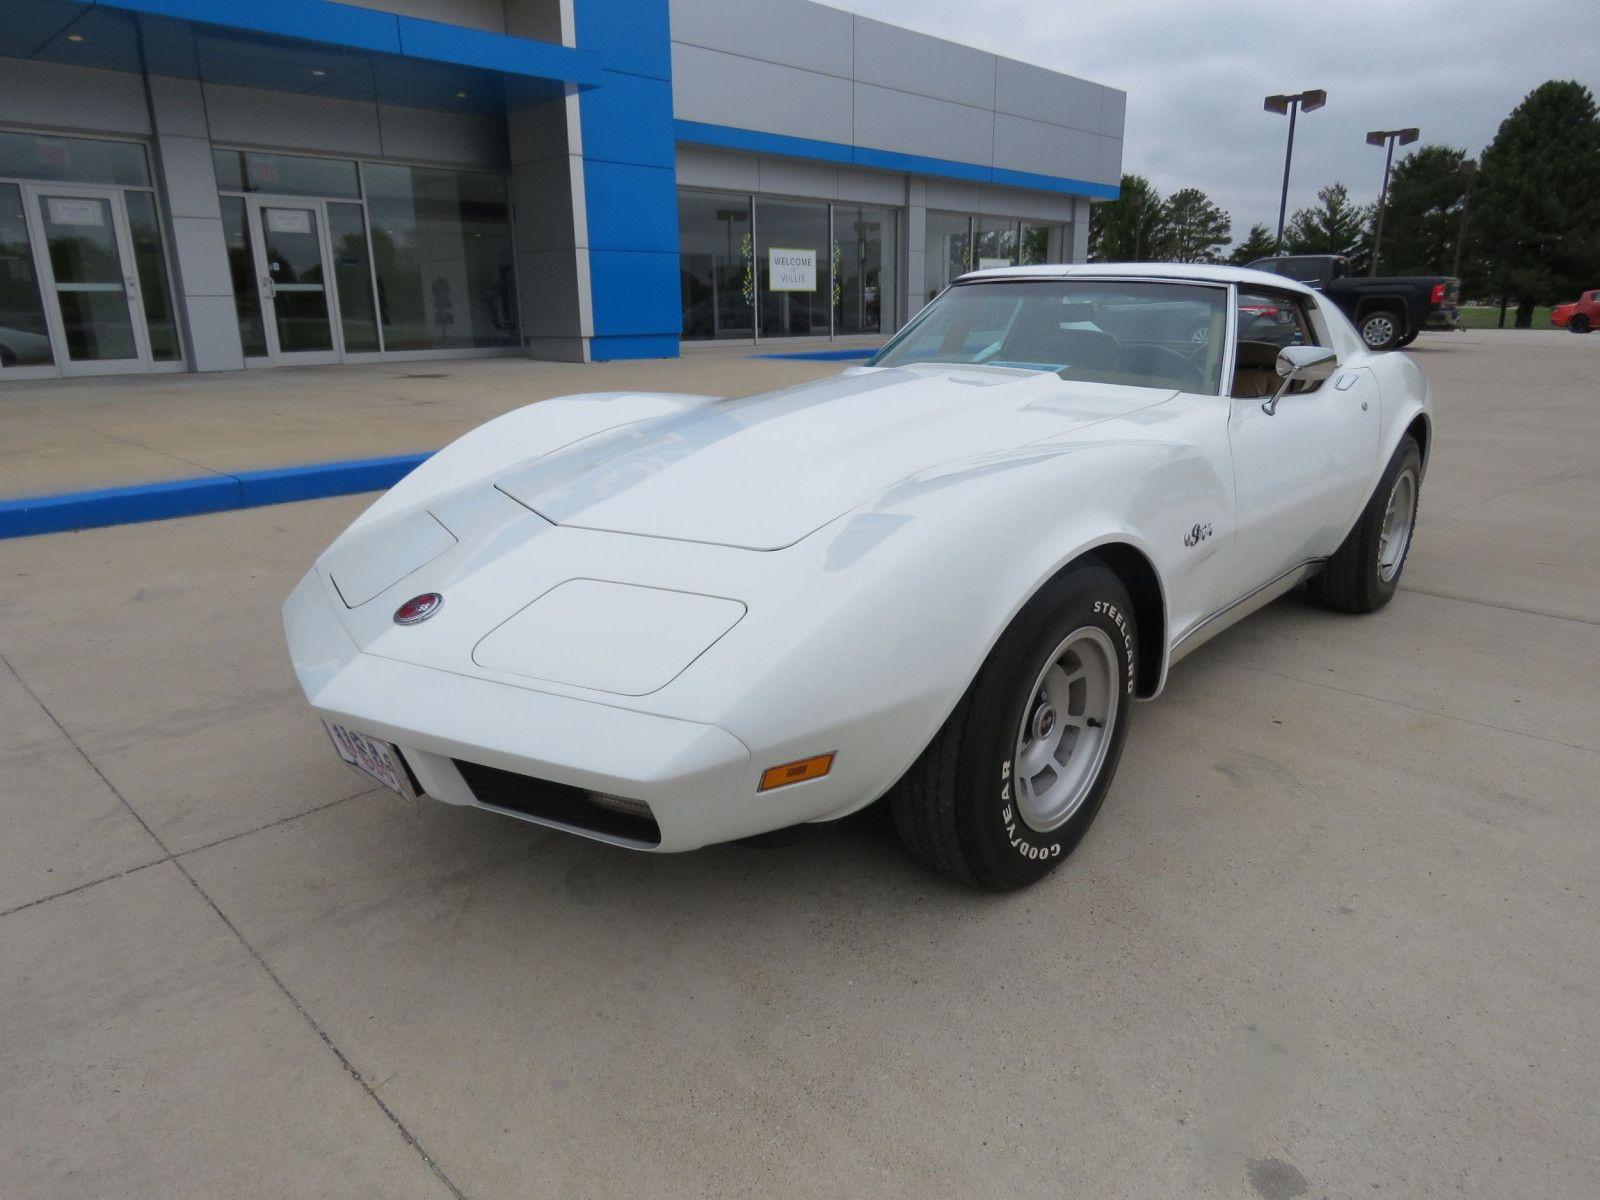 "<img src=""don-1974-corvette.jpg"" alt=""A 1974 Chevrolet L-82 Corvette Coupe"">"